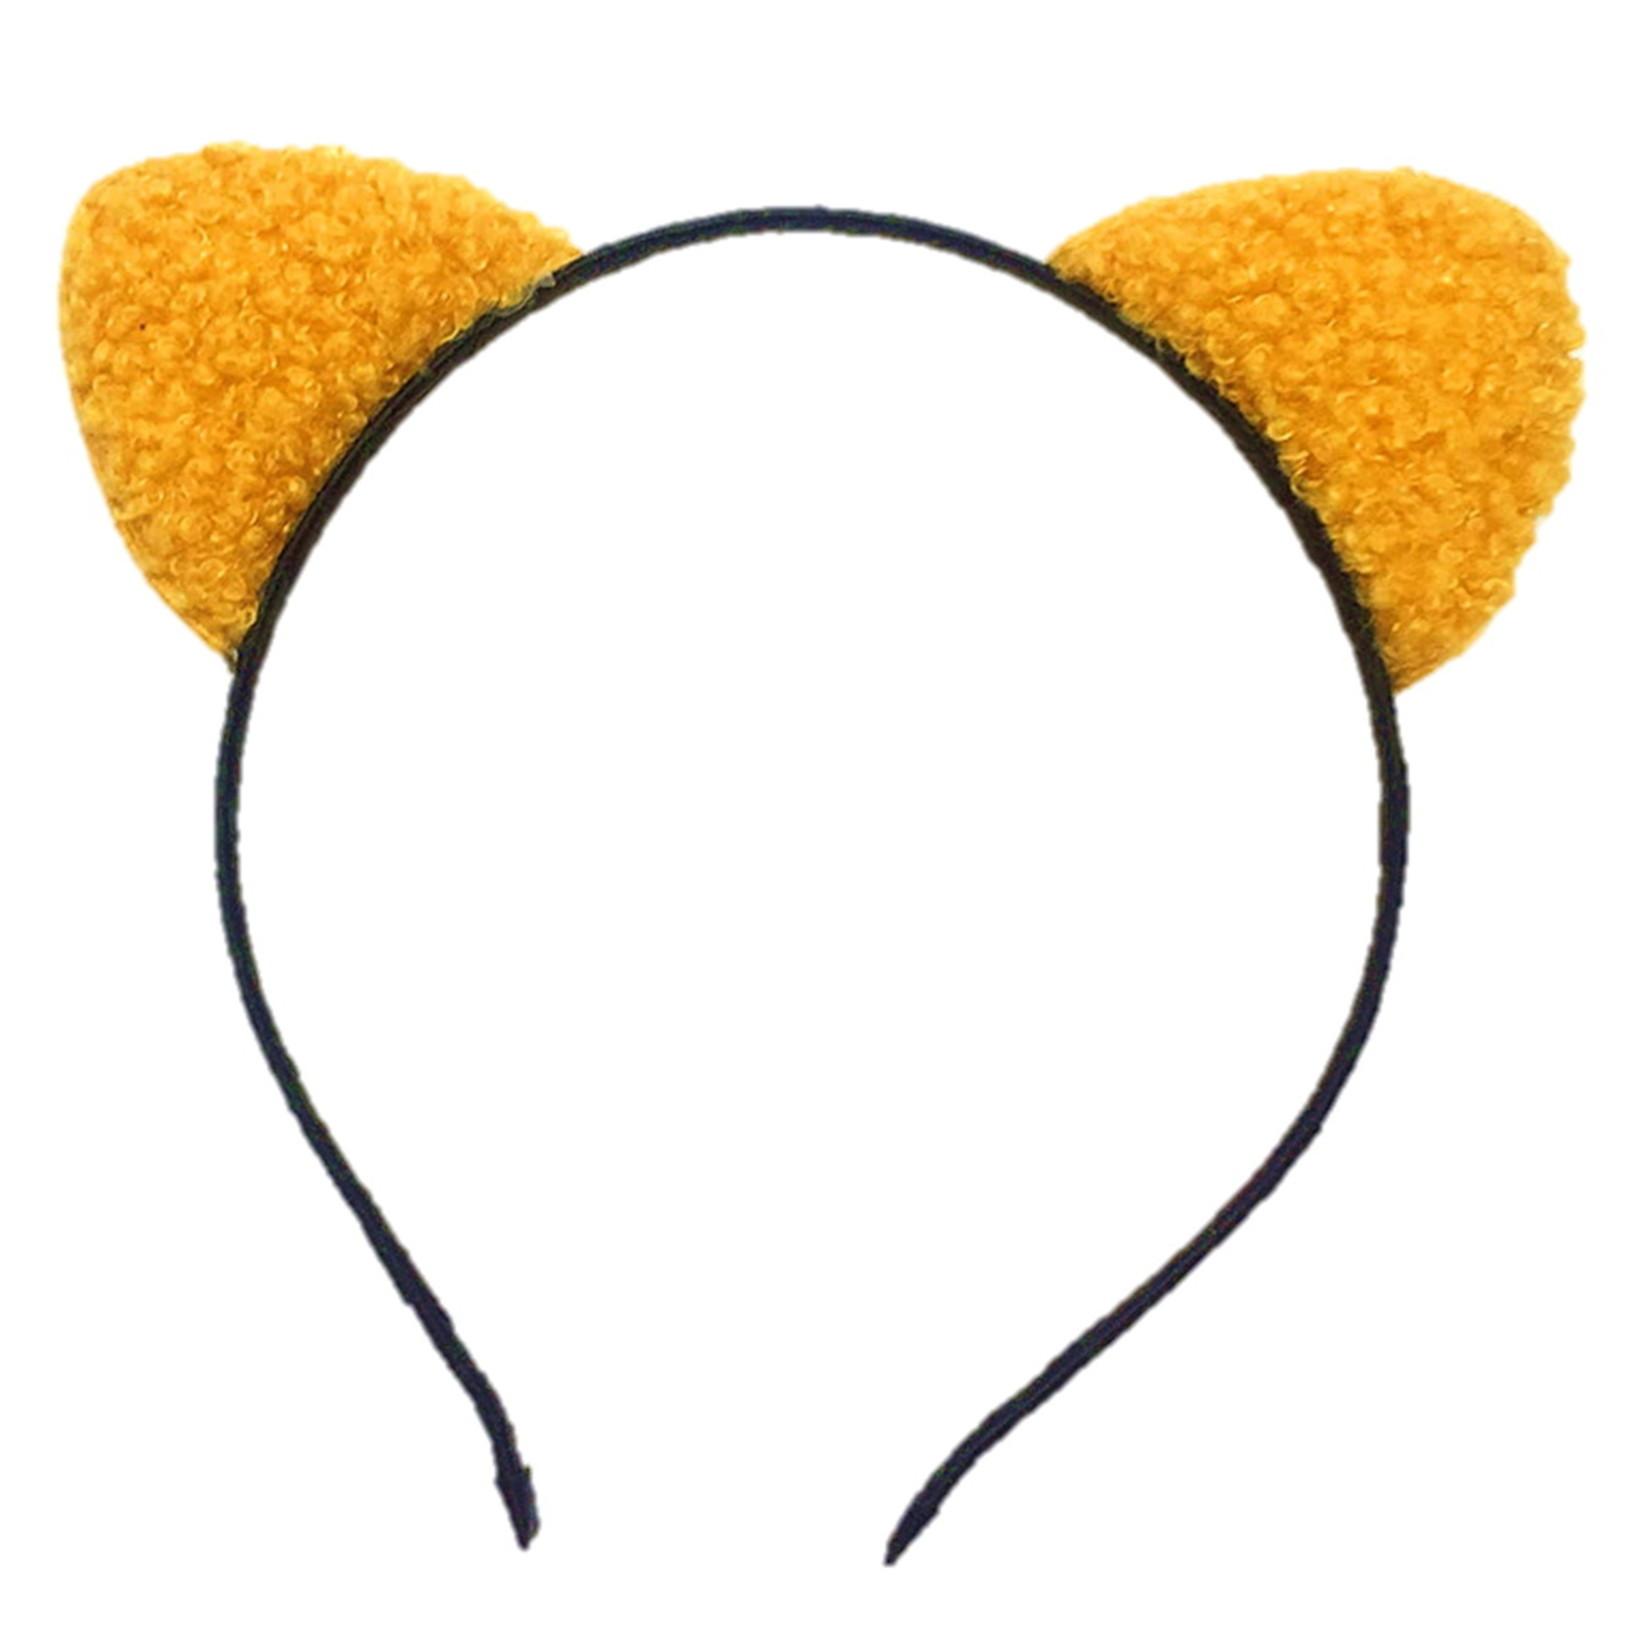 Annienas haarband met zachte oren